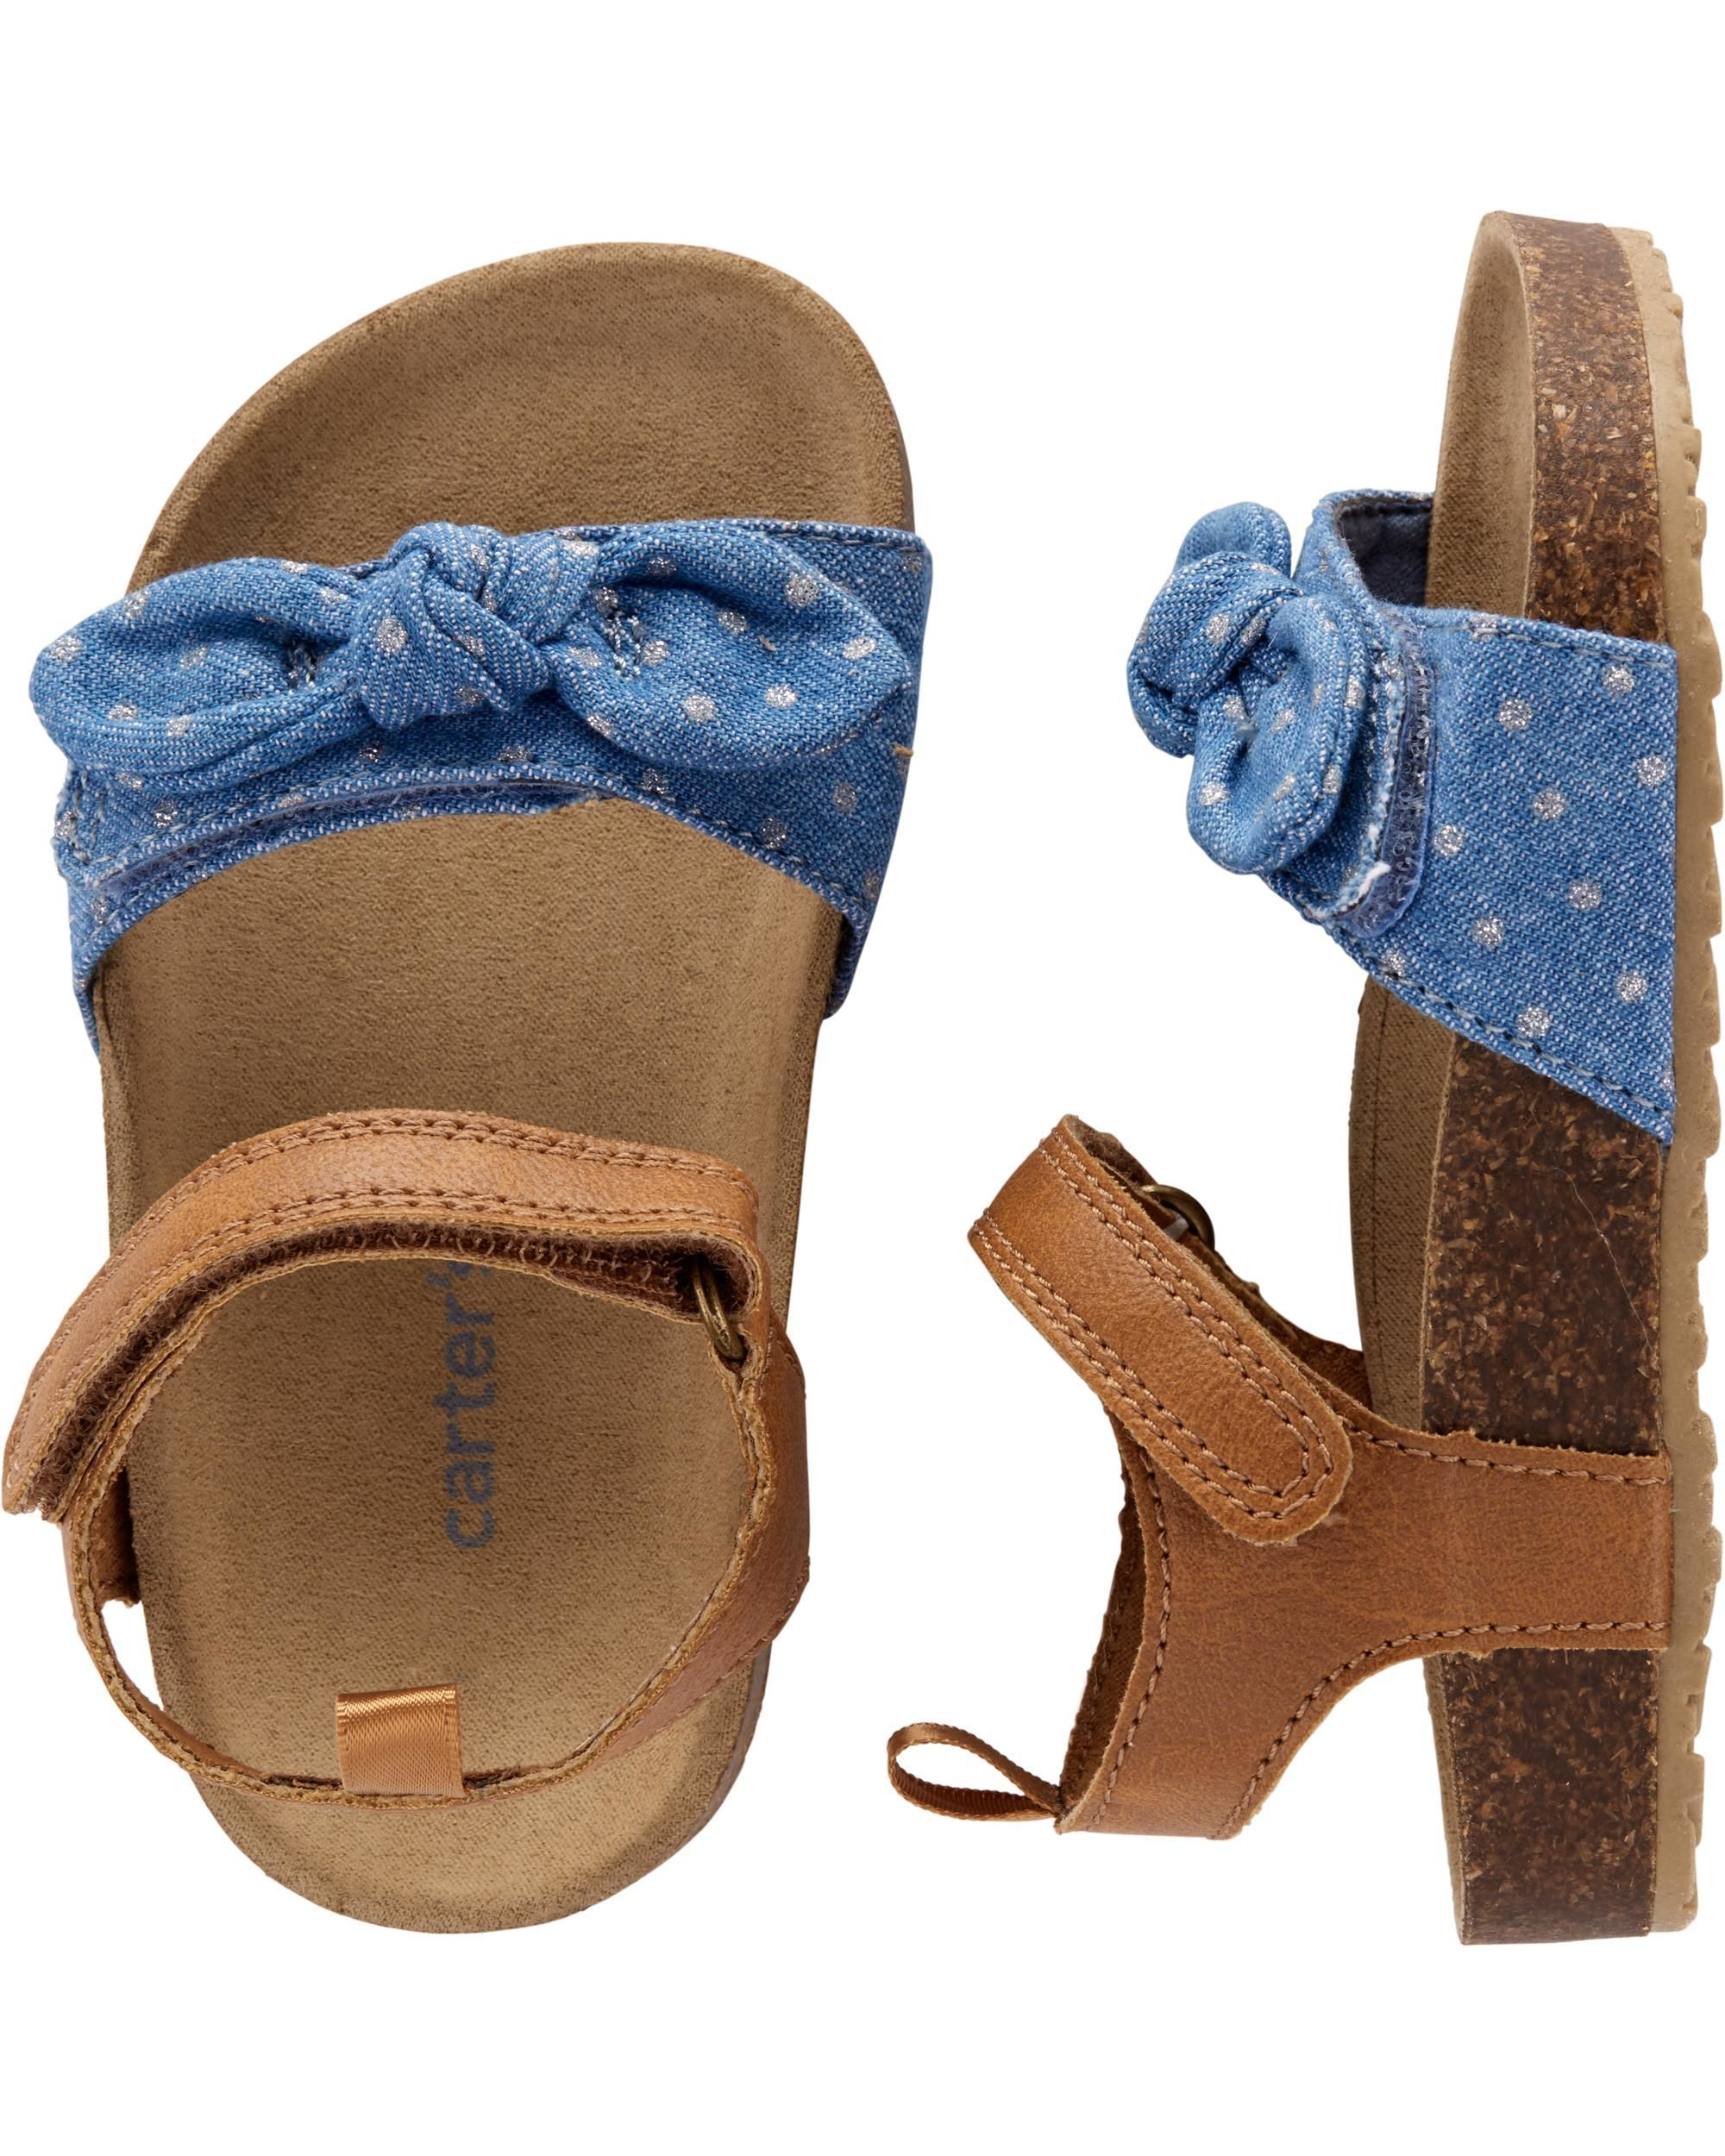 b0ed9b524 Baby Girl Carter s Chambray Cork Sandals